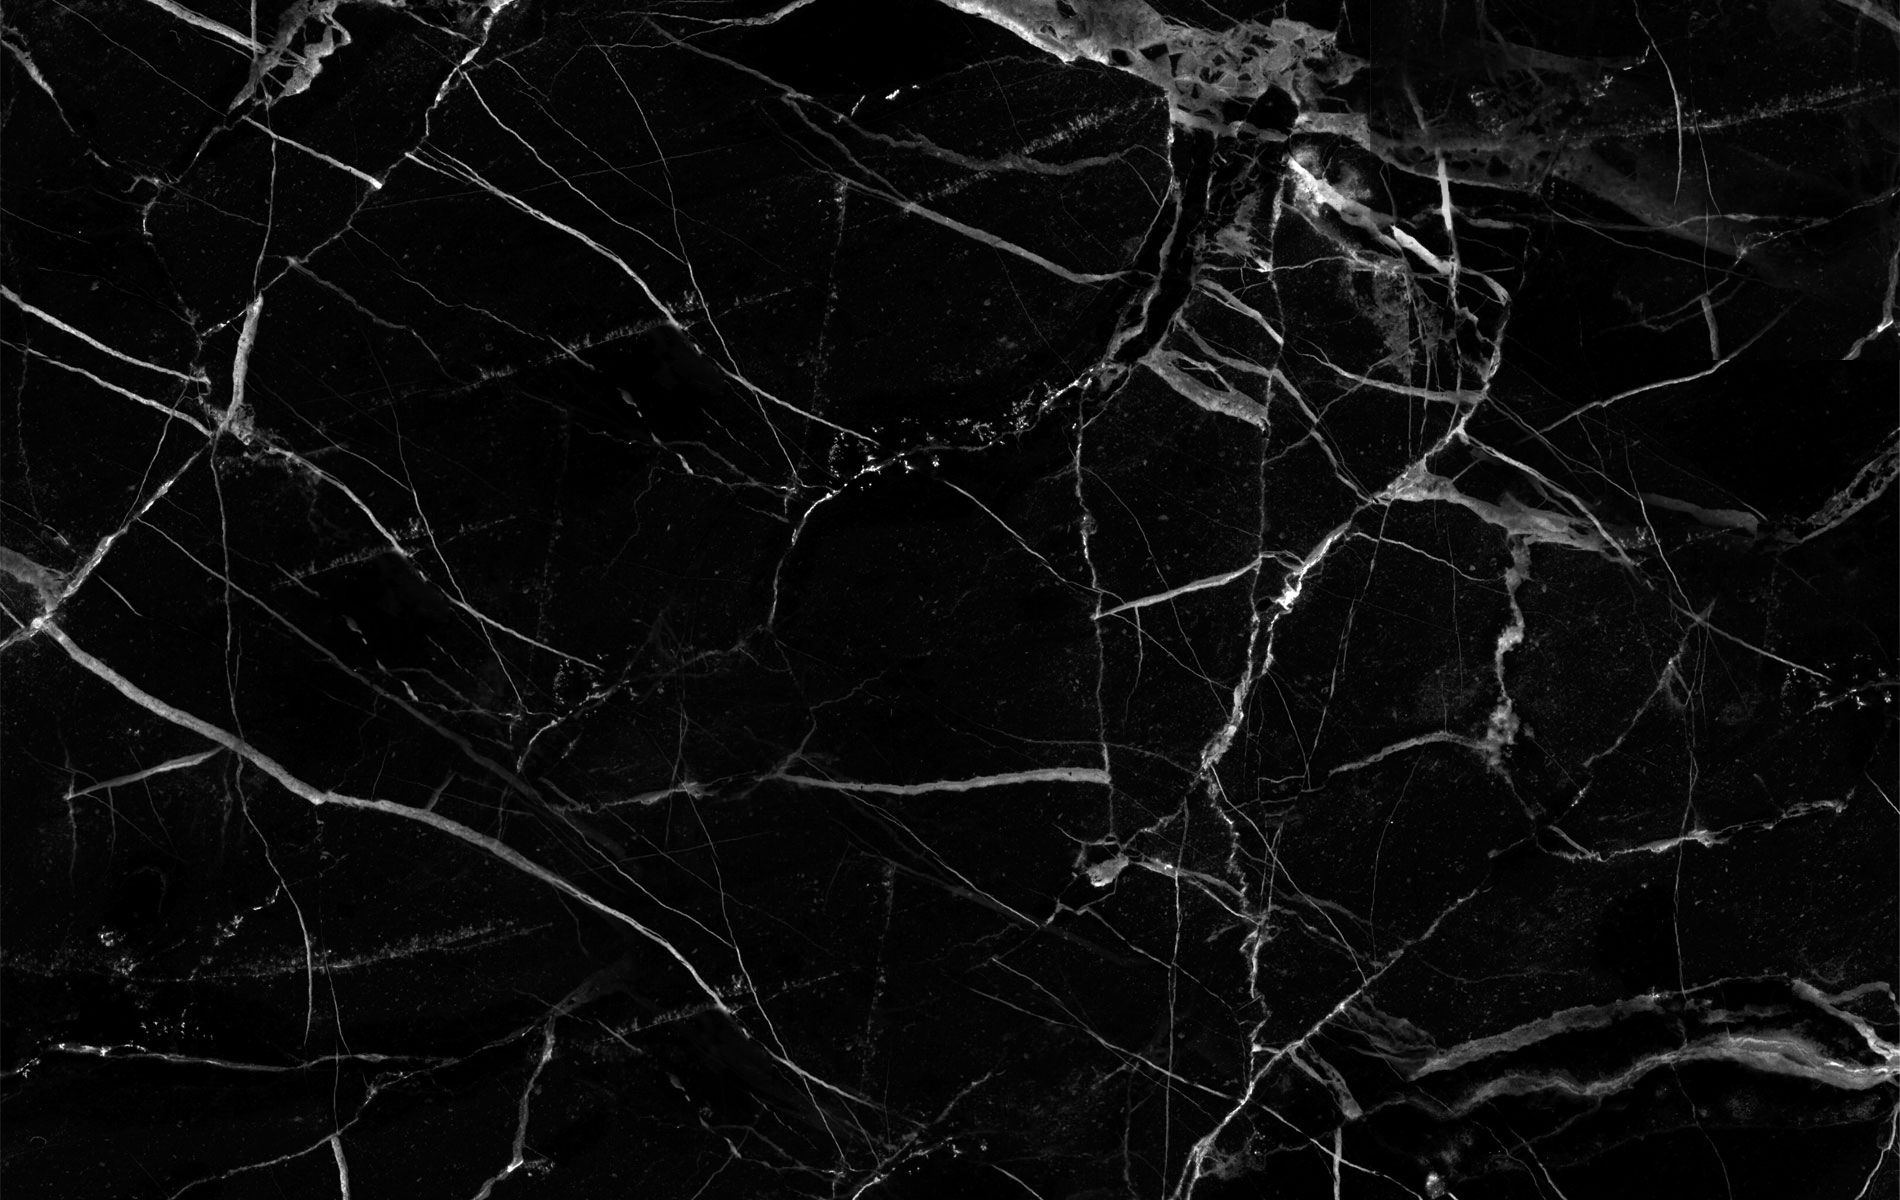 Dark Macbook Wallpaper Hd Aesthetic See more macbook wallpaper, good macbook wallpapers, macbook pro wallpaper, macbook retina wallpaper, macbook backgrounds, clean macbook wallpaper. dark macbook wallpaper hd aesthetic